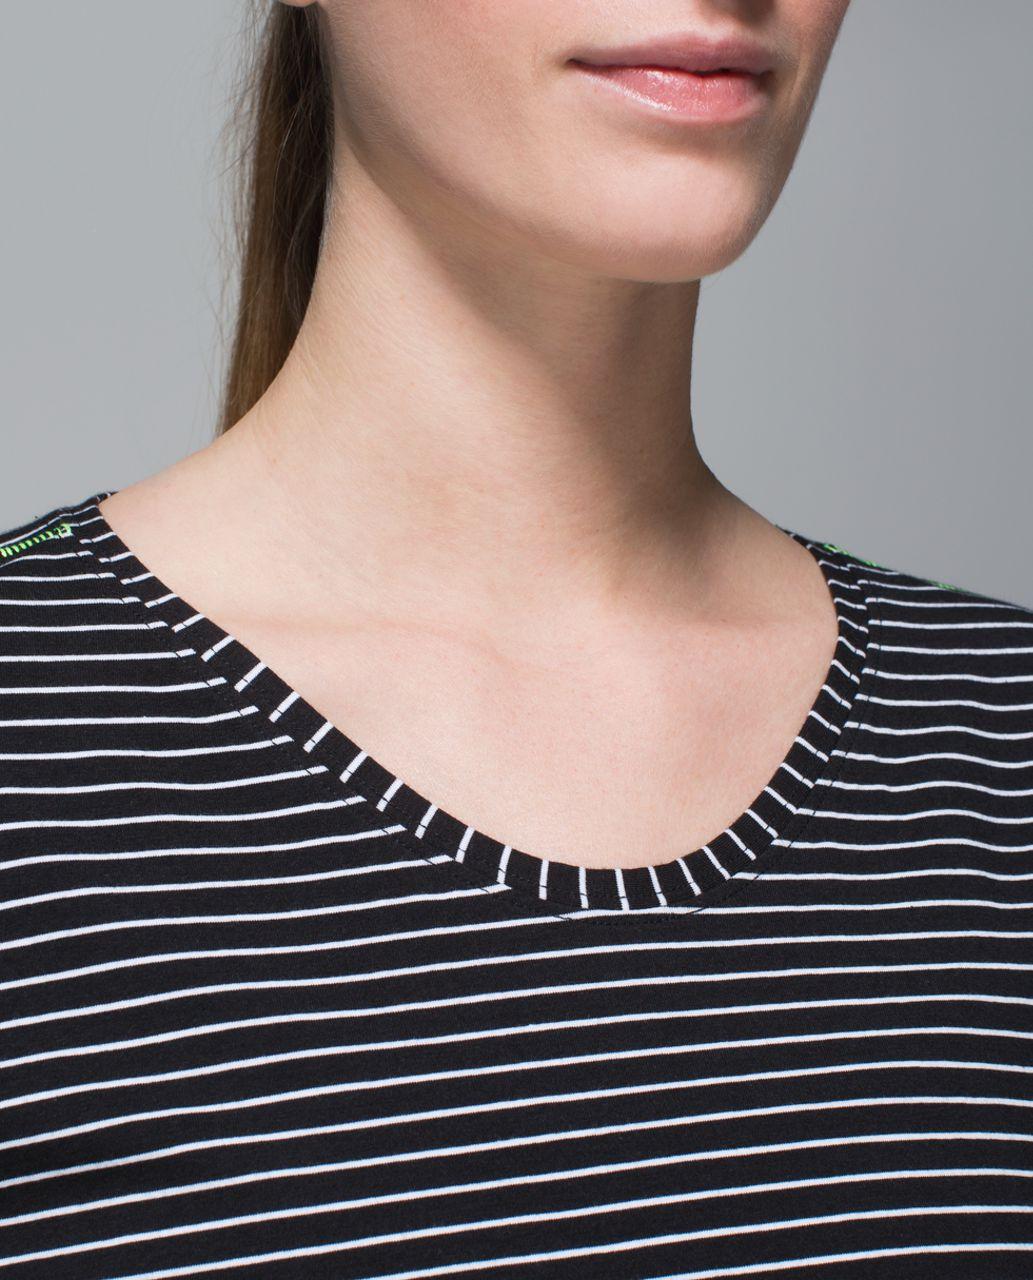 Lululemon Weekend Short Sleeve - Parallel Stripe Black White